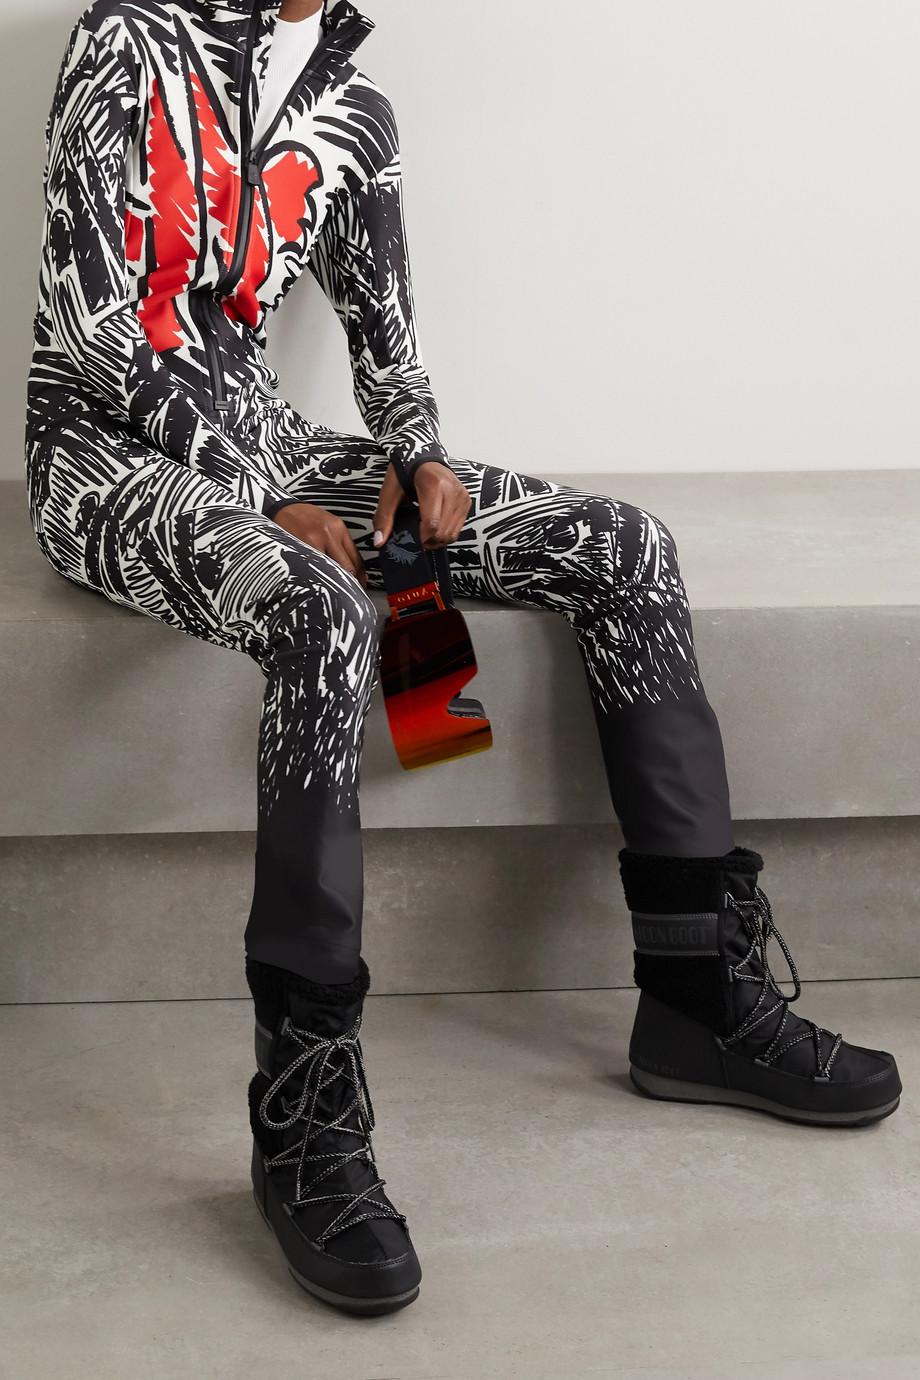 Moncler Genius + 3 Moncler Grenoble Tuta printed ski suit